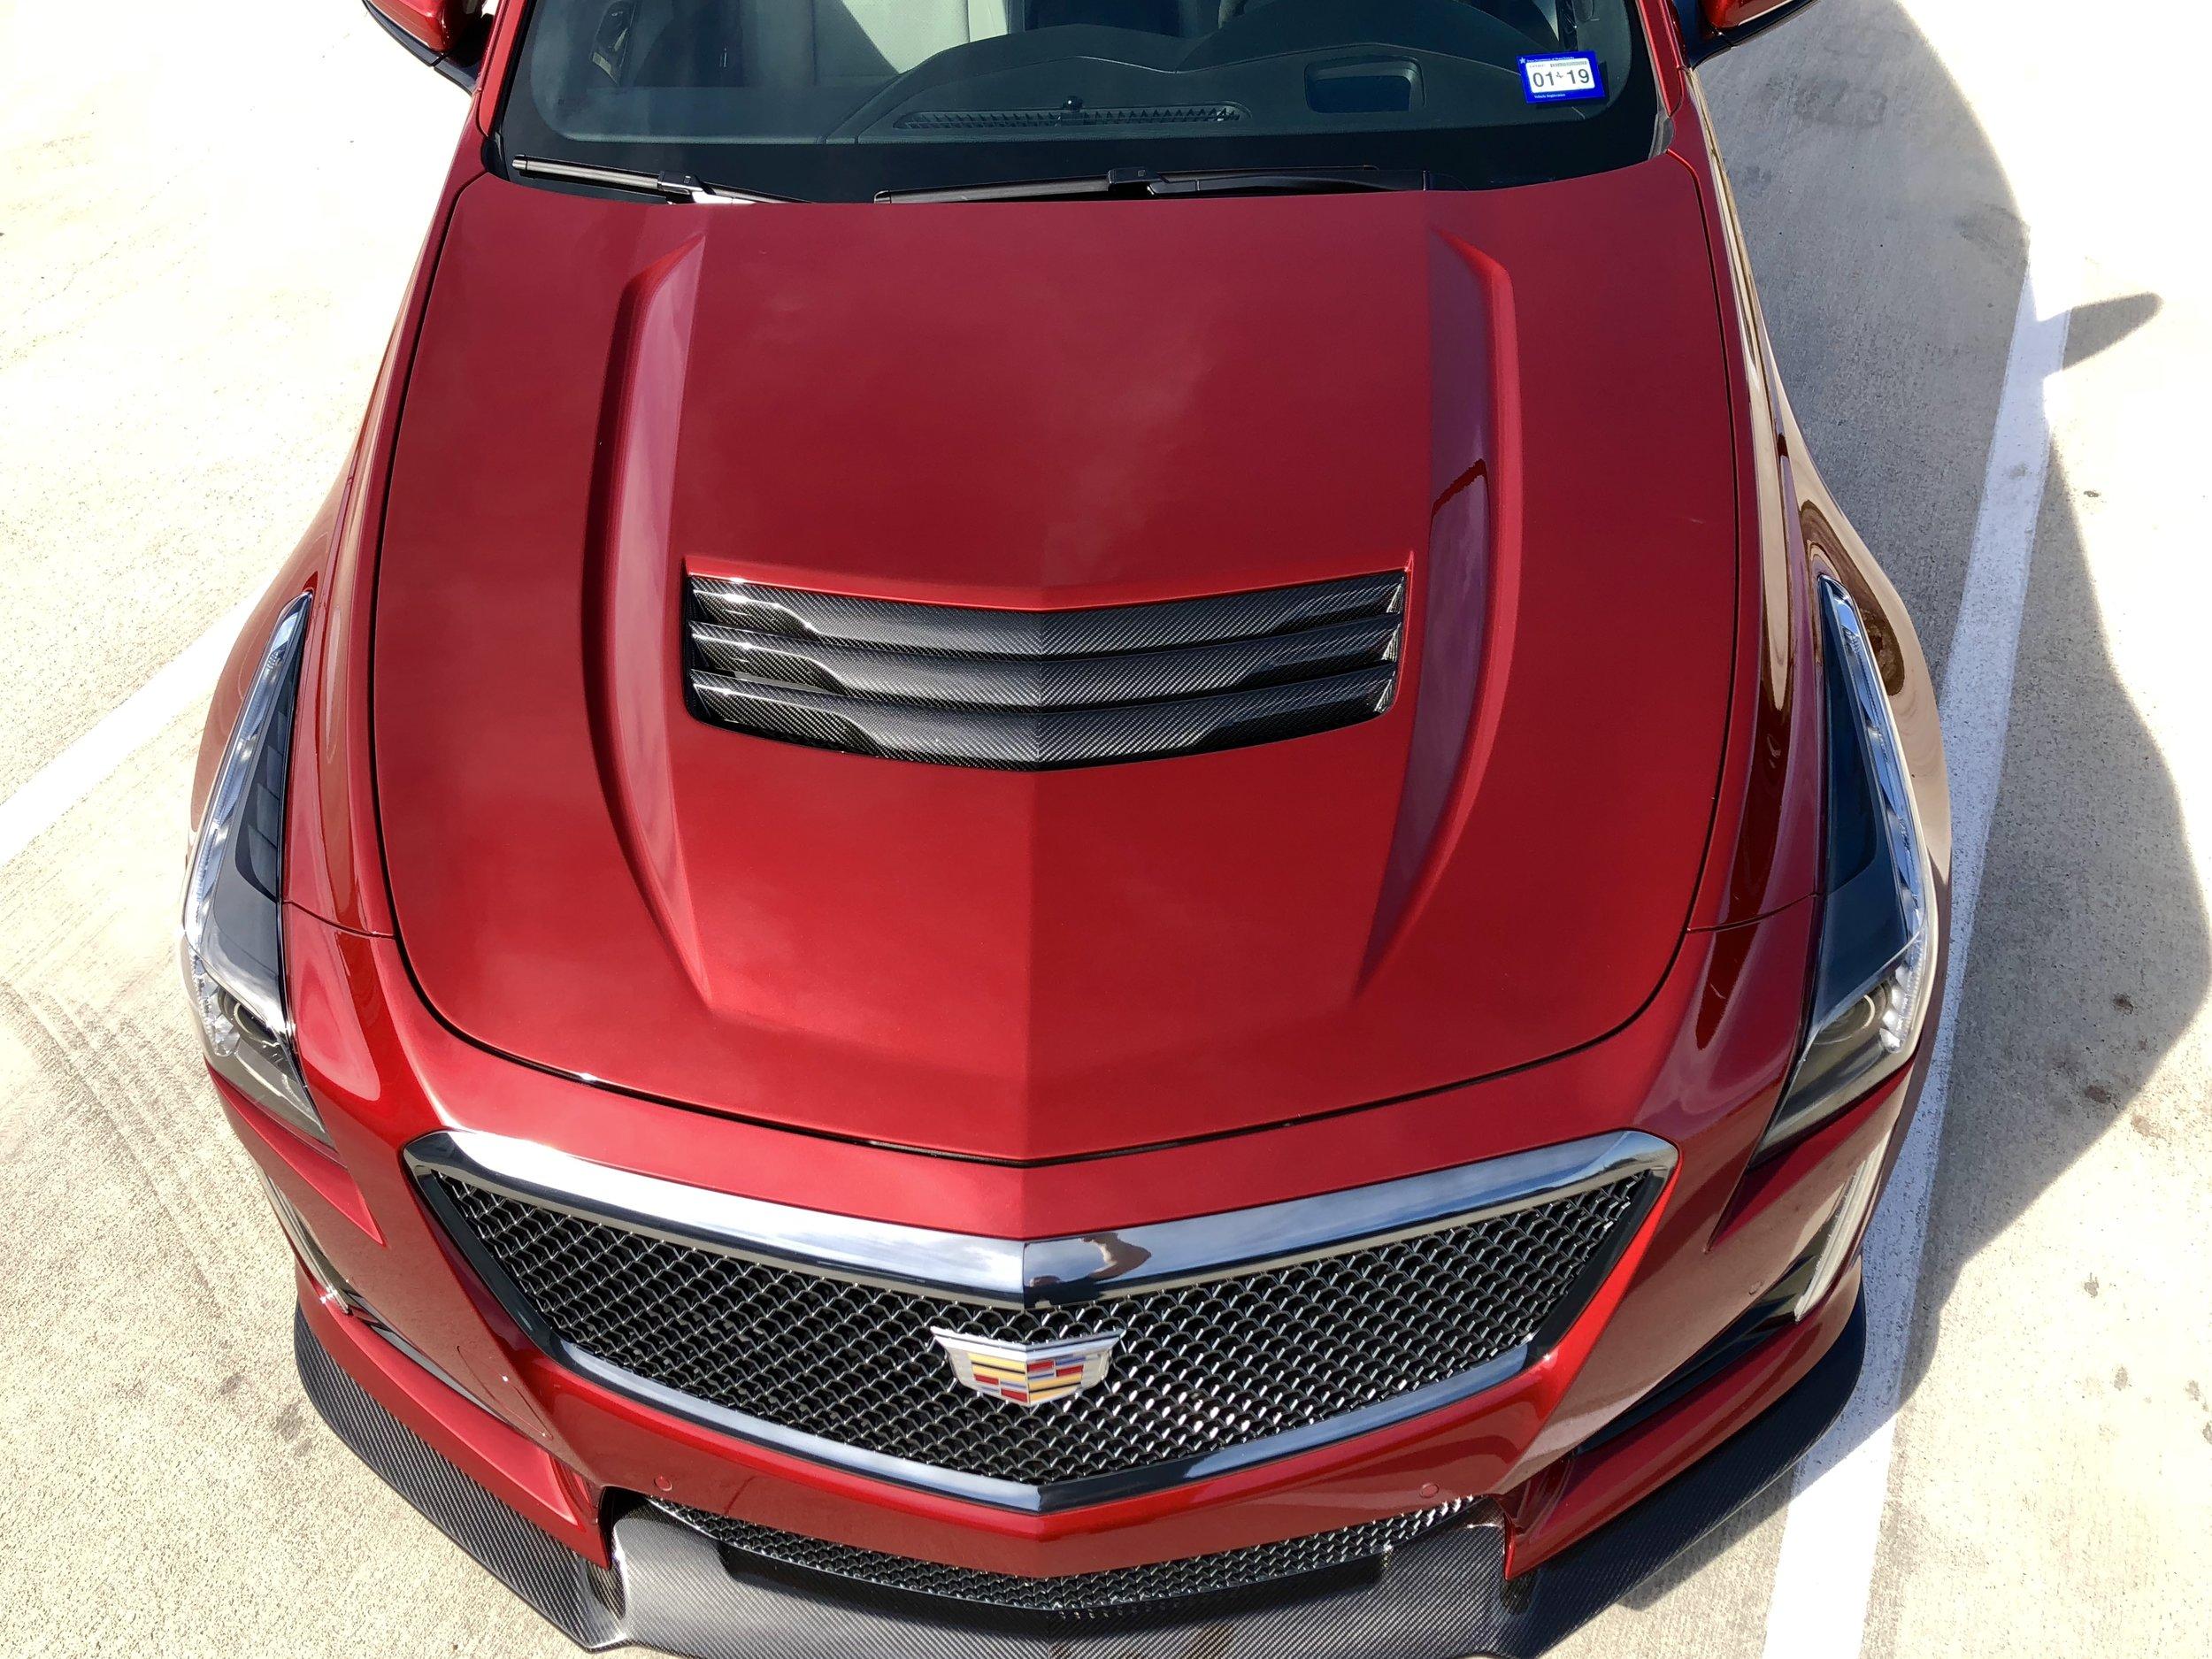 Cadillac CTSV Paint Protection Film